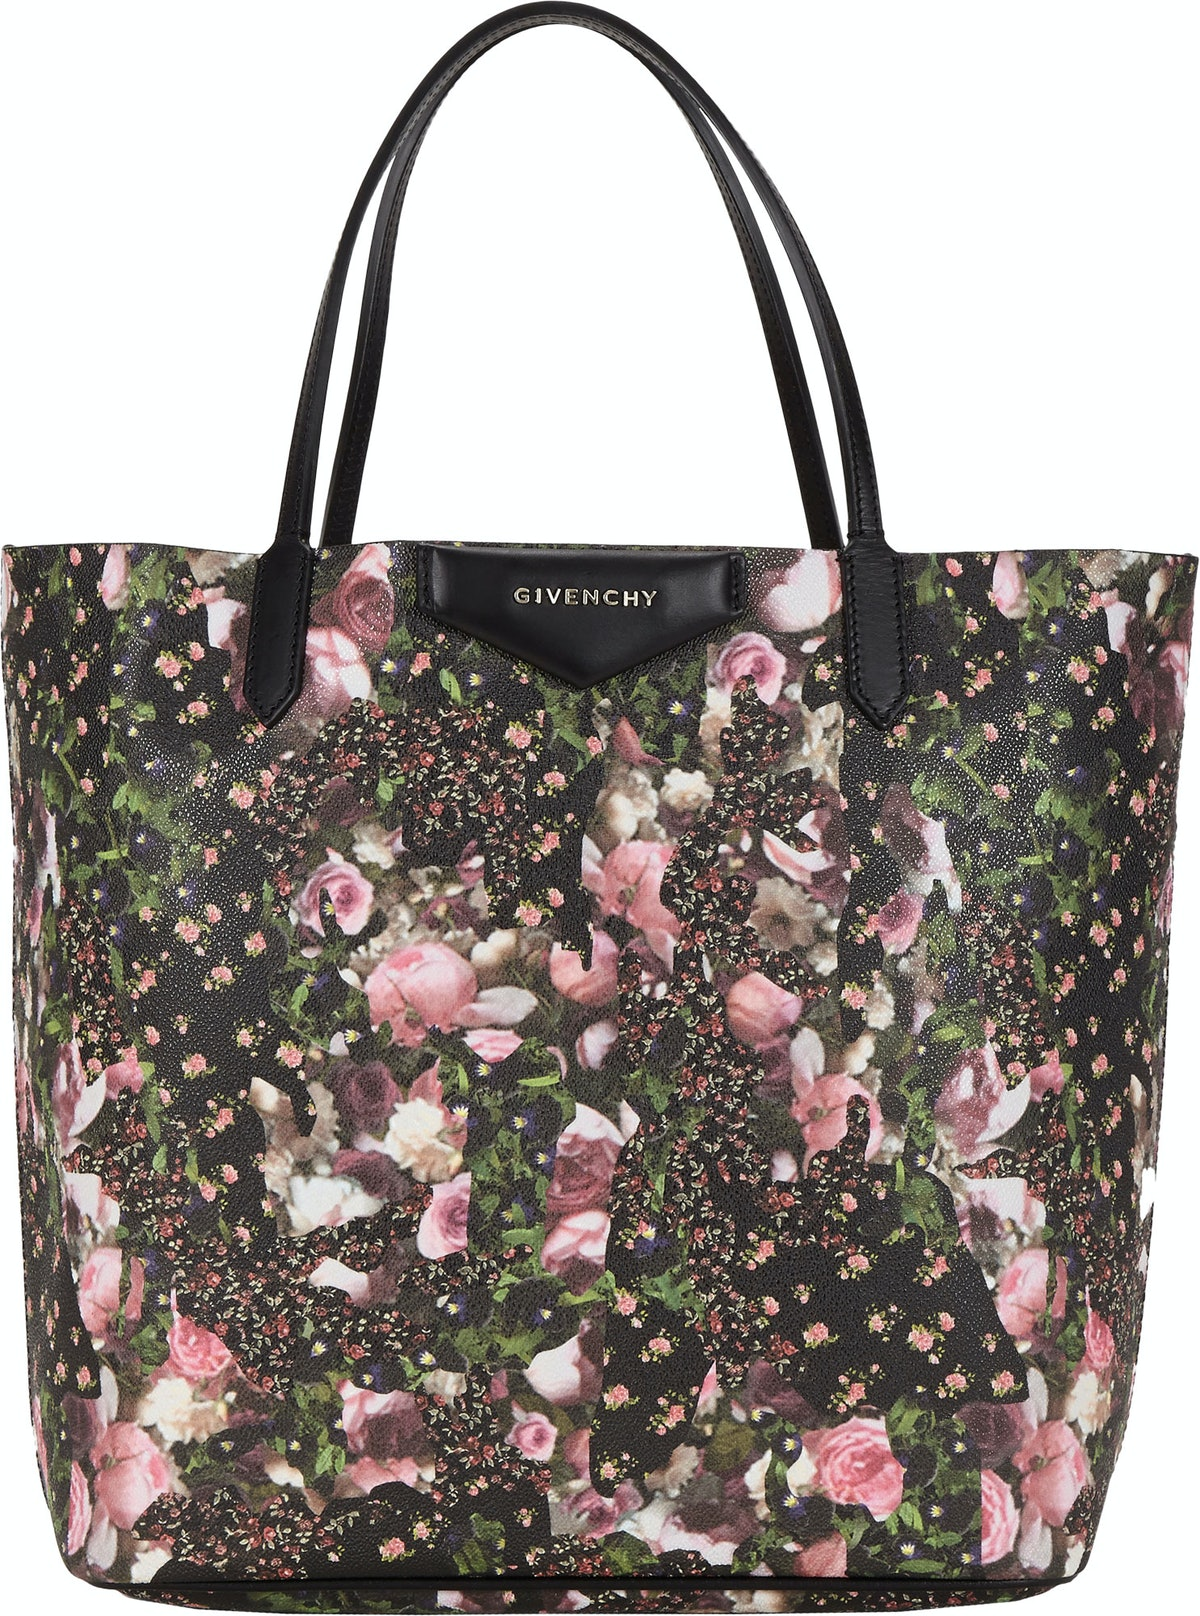 Givenchy tote bag, $975, [barneys.com](http://rstyle.me/n/encrp35fn).